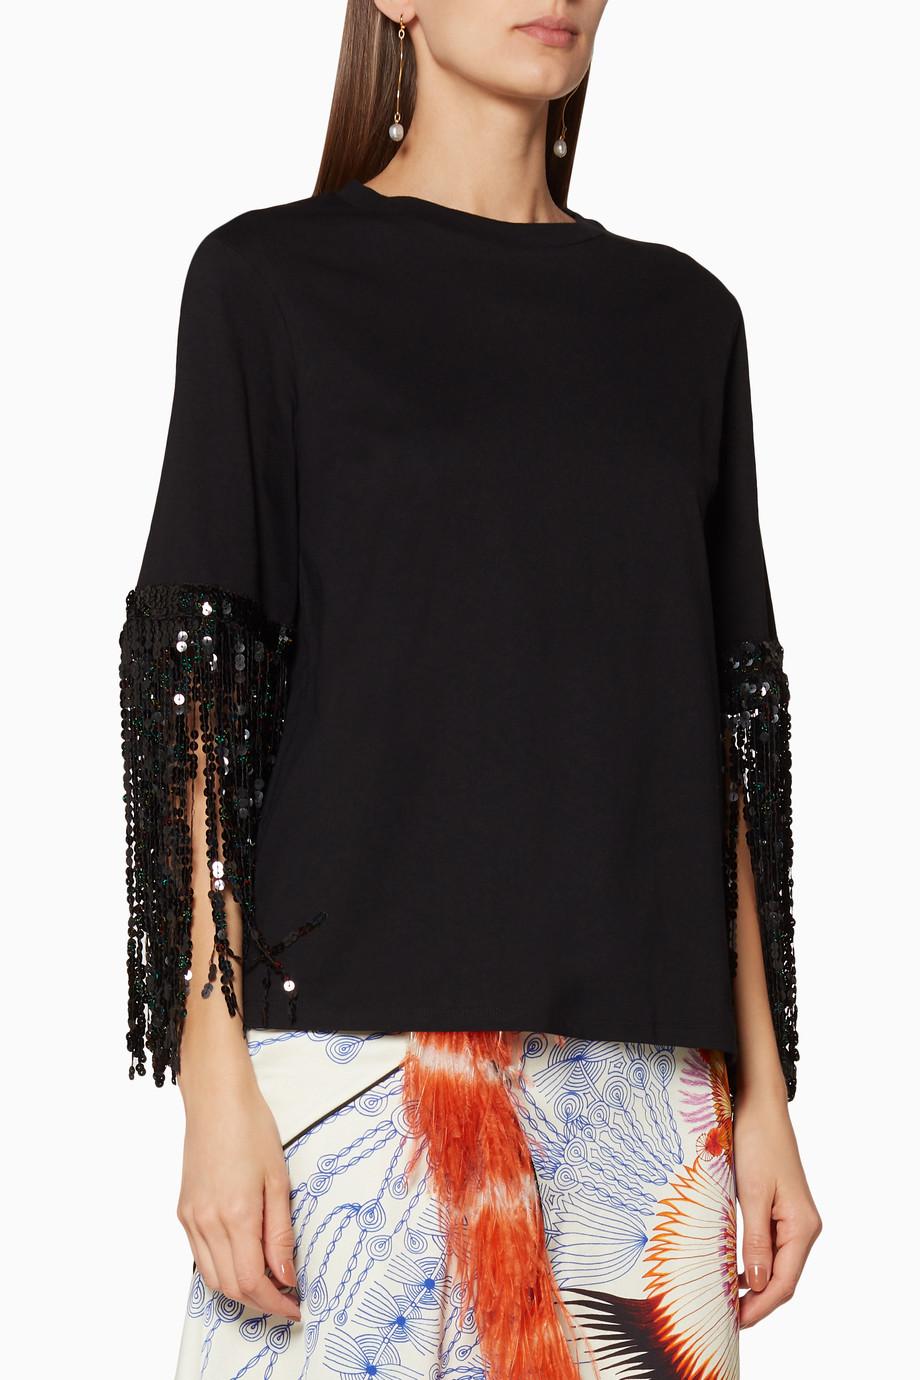 aa027050c9ee4 Shop Romance Was Born Black Black Star-Sequin T-Shirt for Women ...